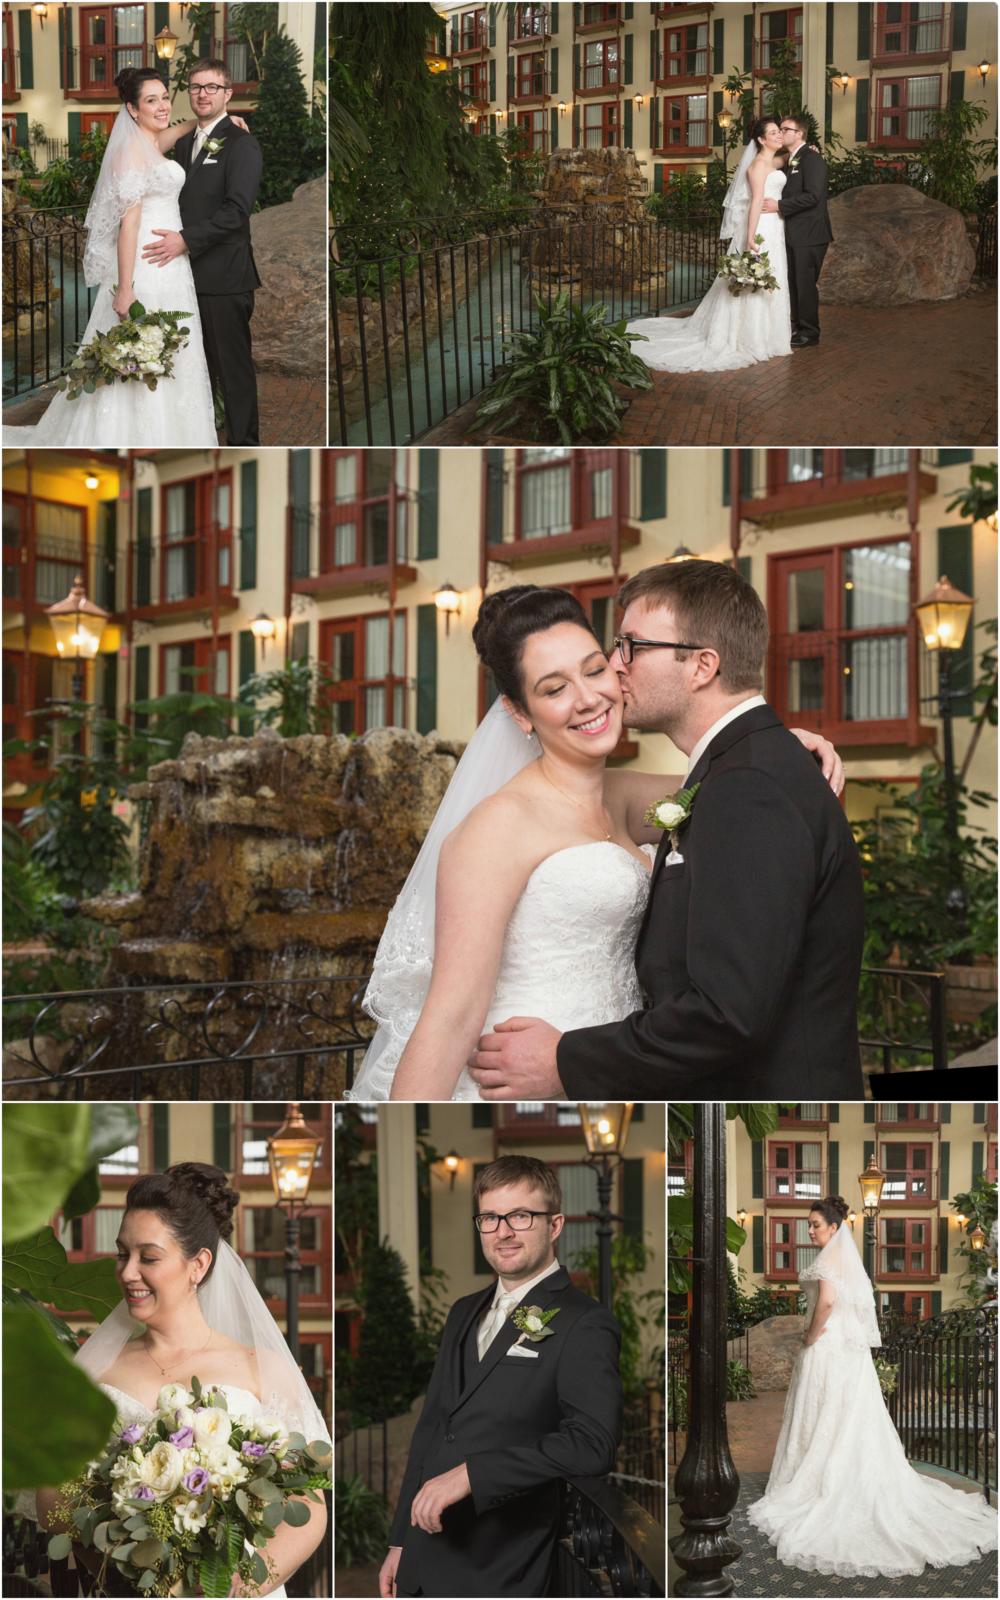 Lethbridge_Lodge_Wedding_06.png